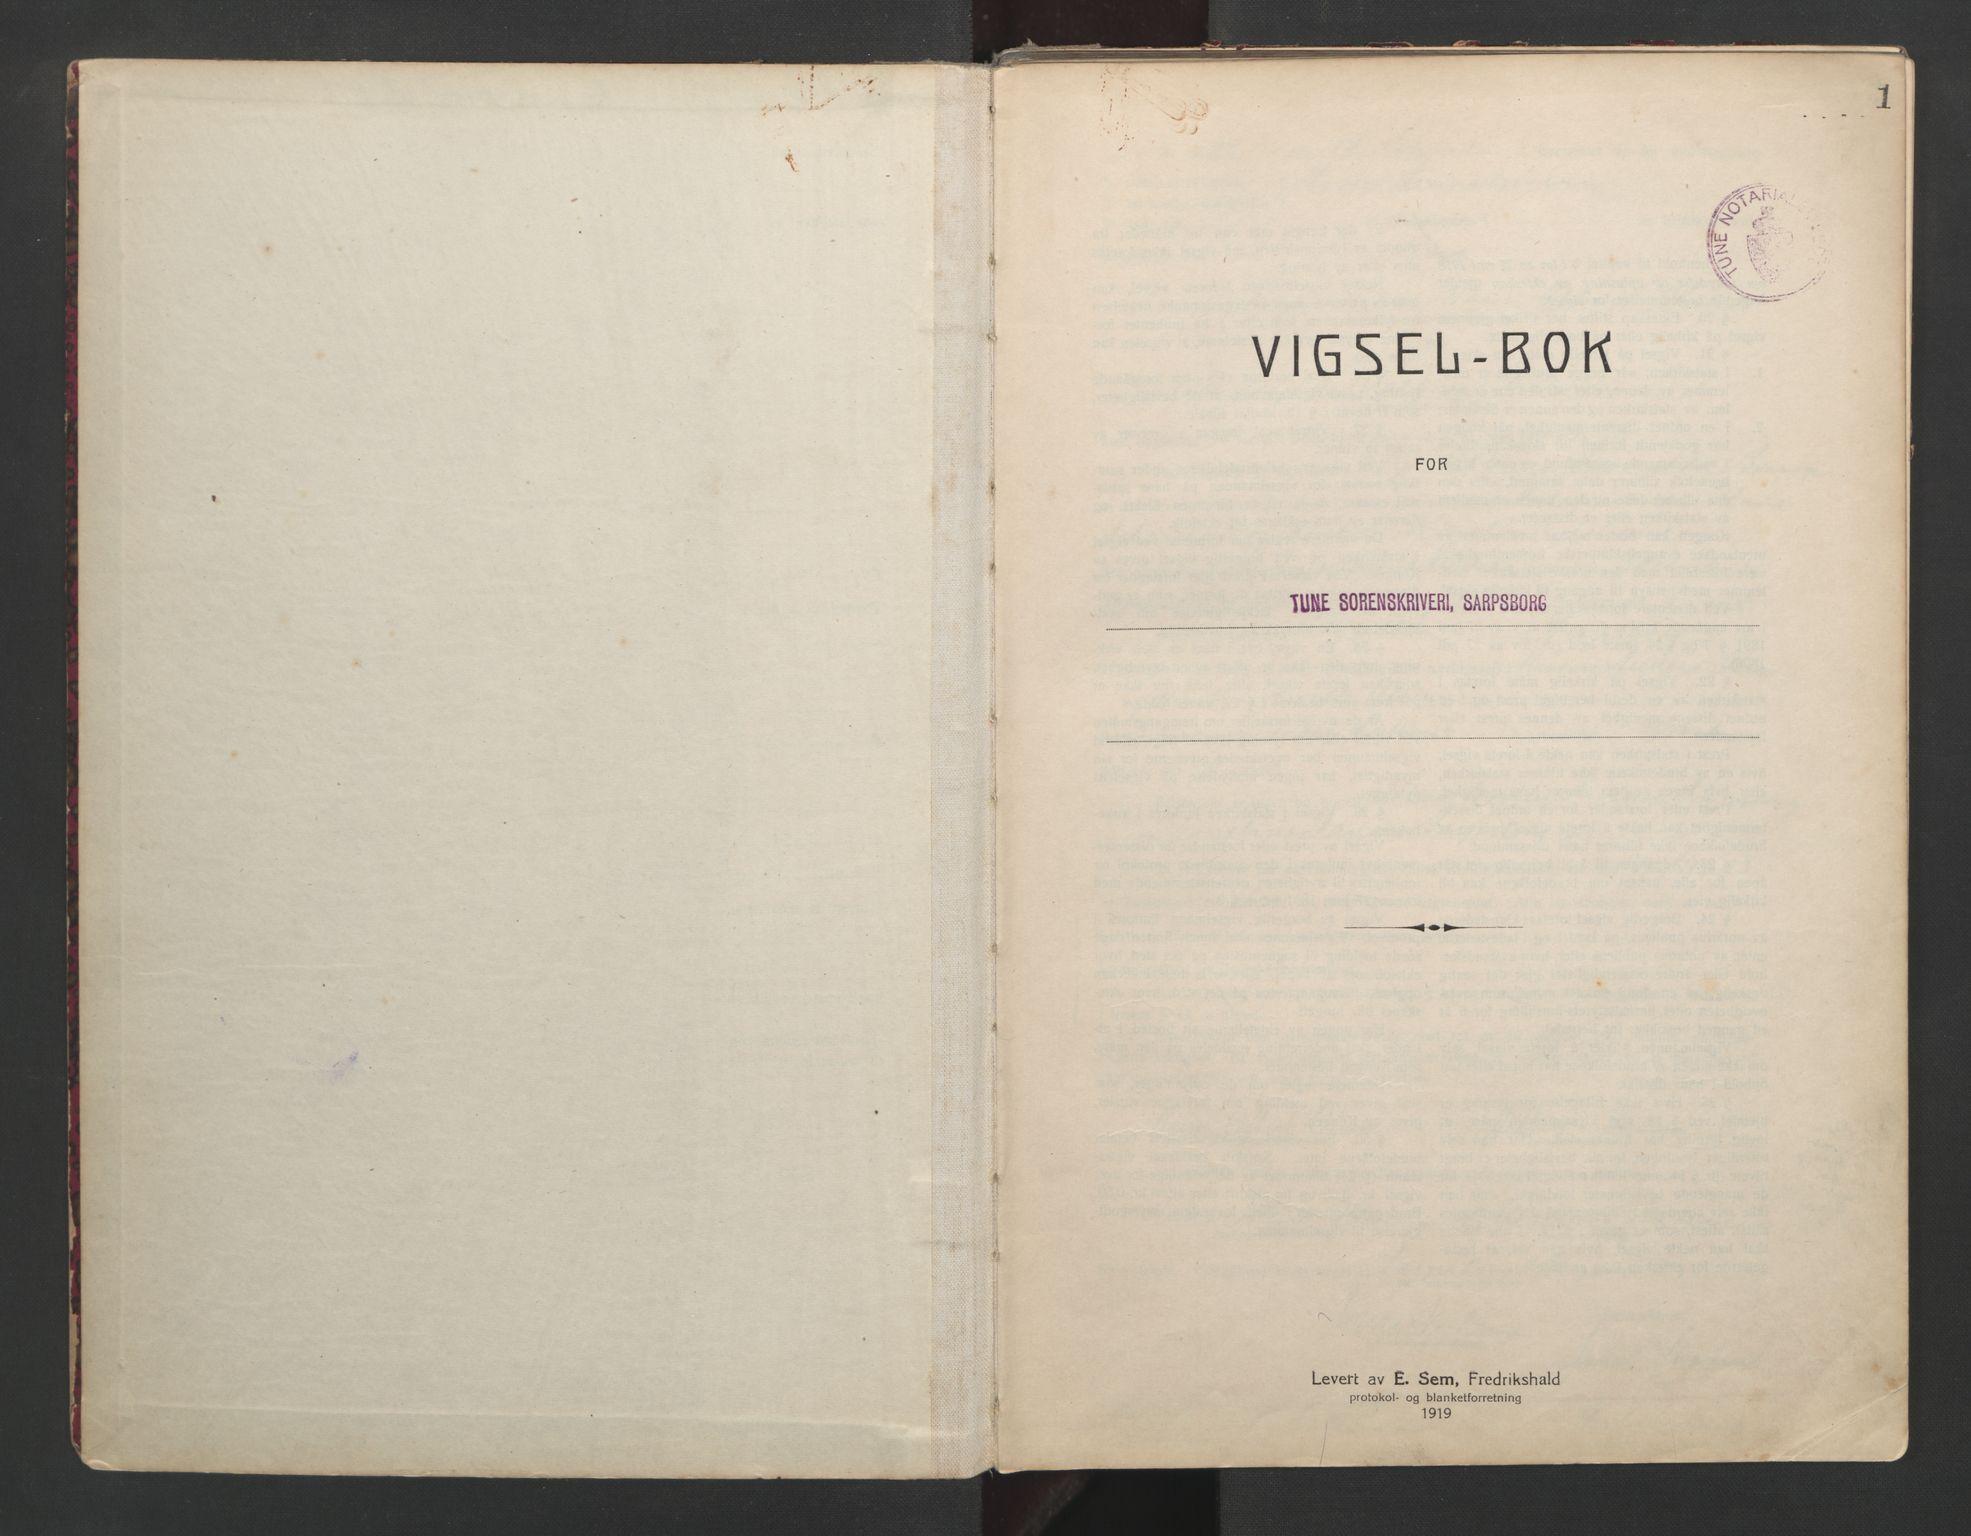 SAO, Tune sorenskriveri, L/Lb/L0001: Vigselprotokoll, 1923-1943, s. 1